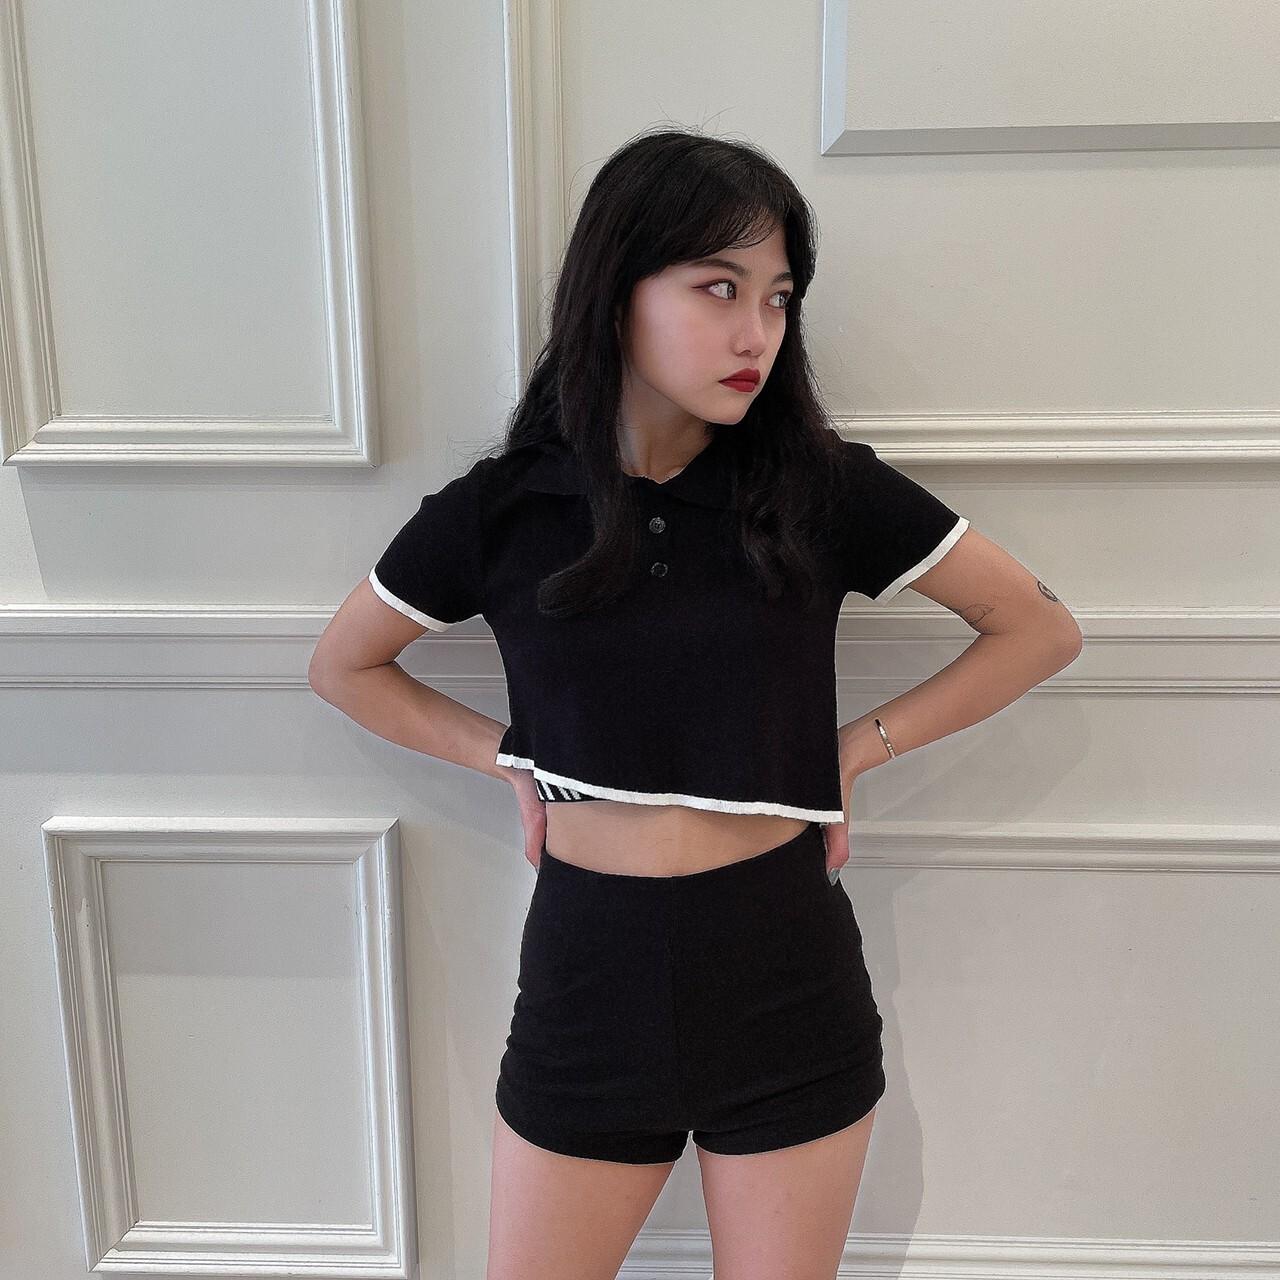 【Belle】tight short pannts